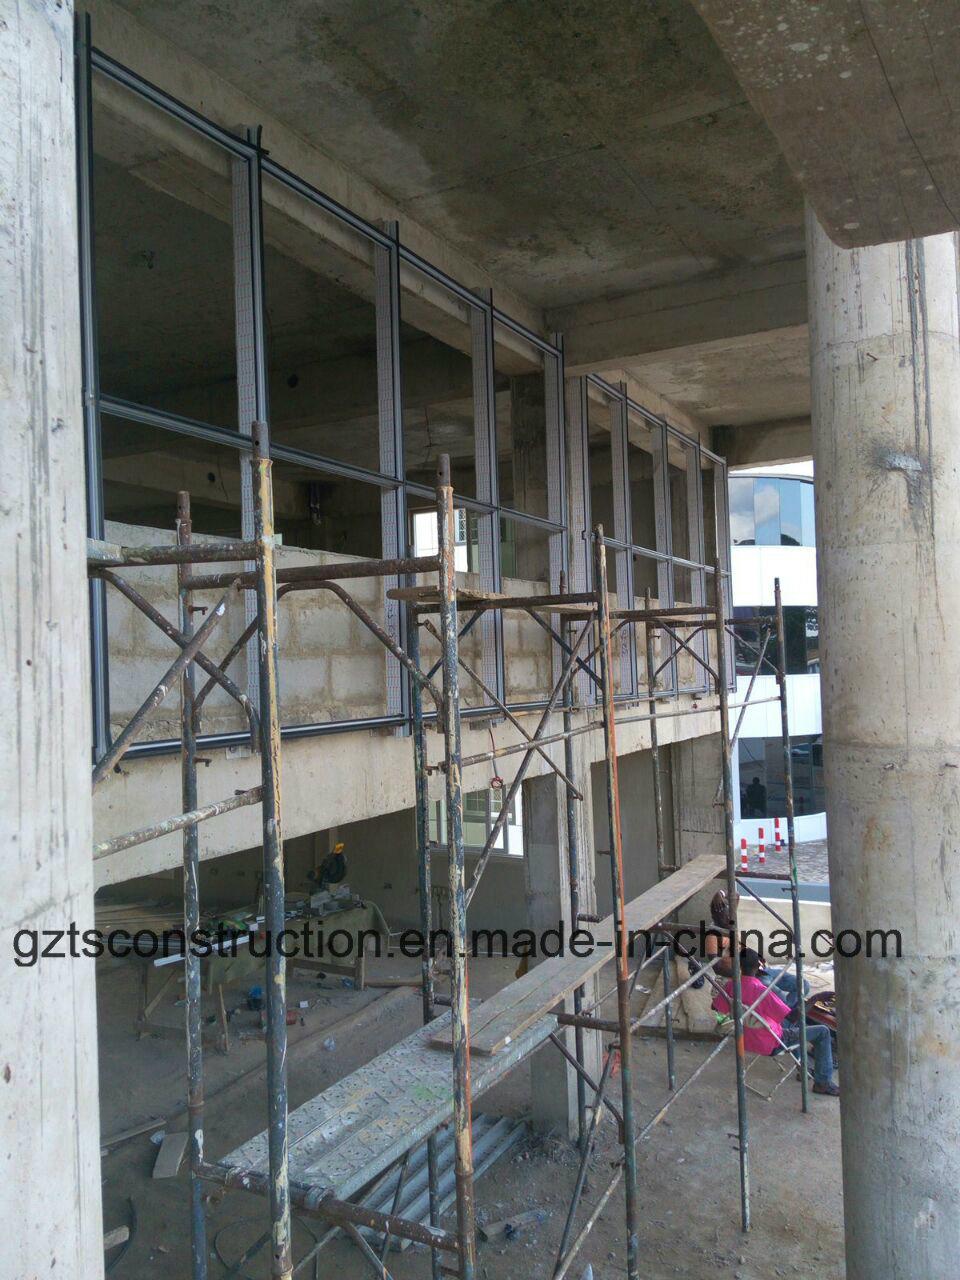 Glass Curtain Wall Aluminum Curtain Wall for Africa